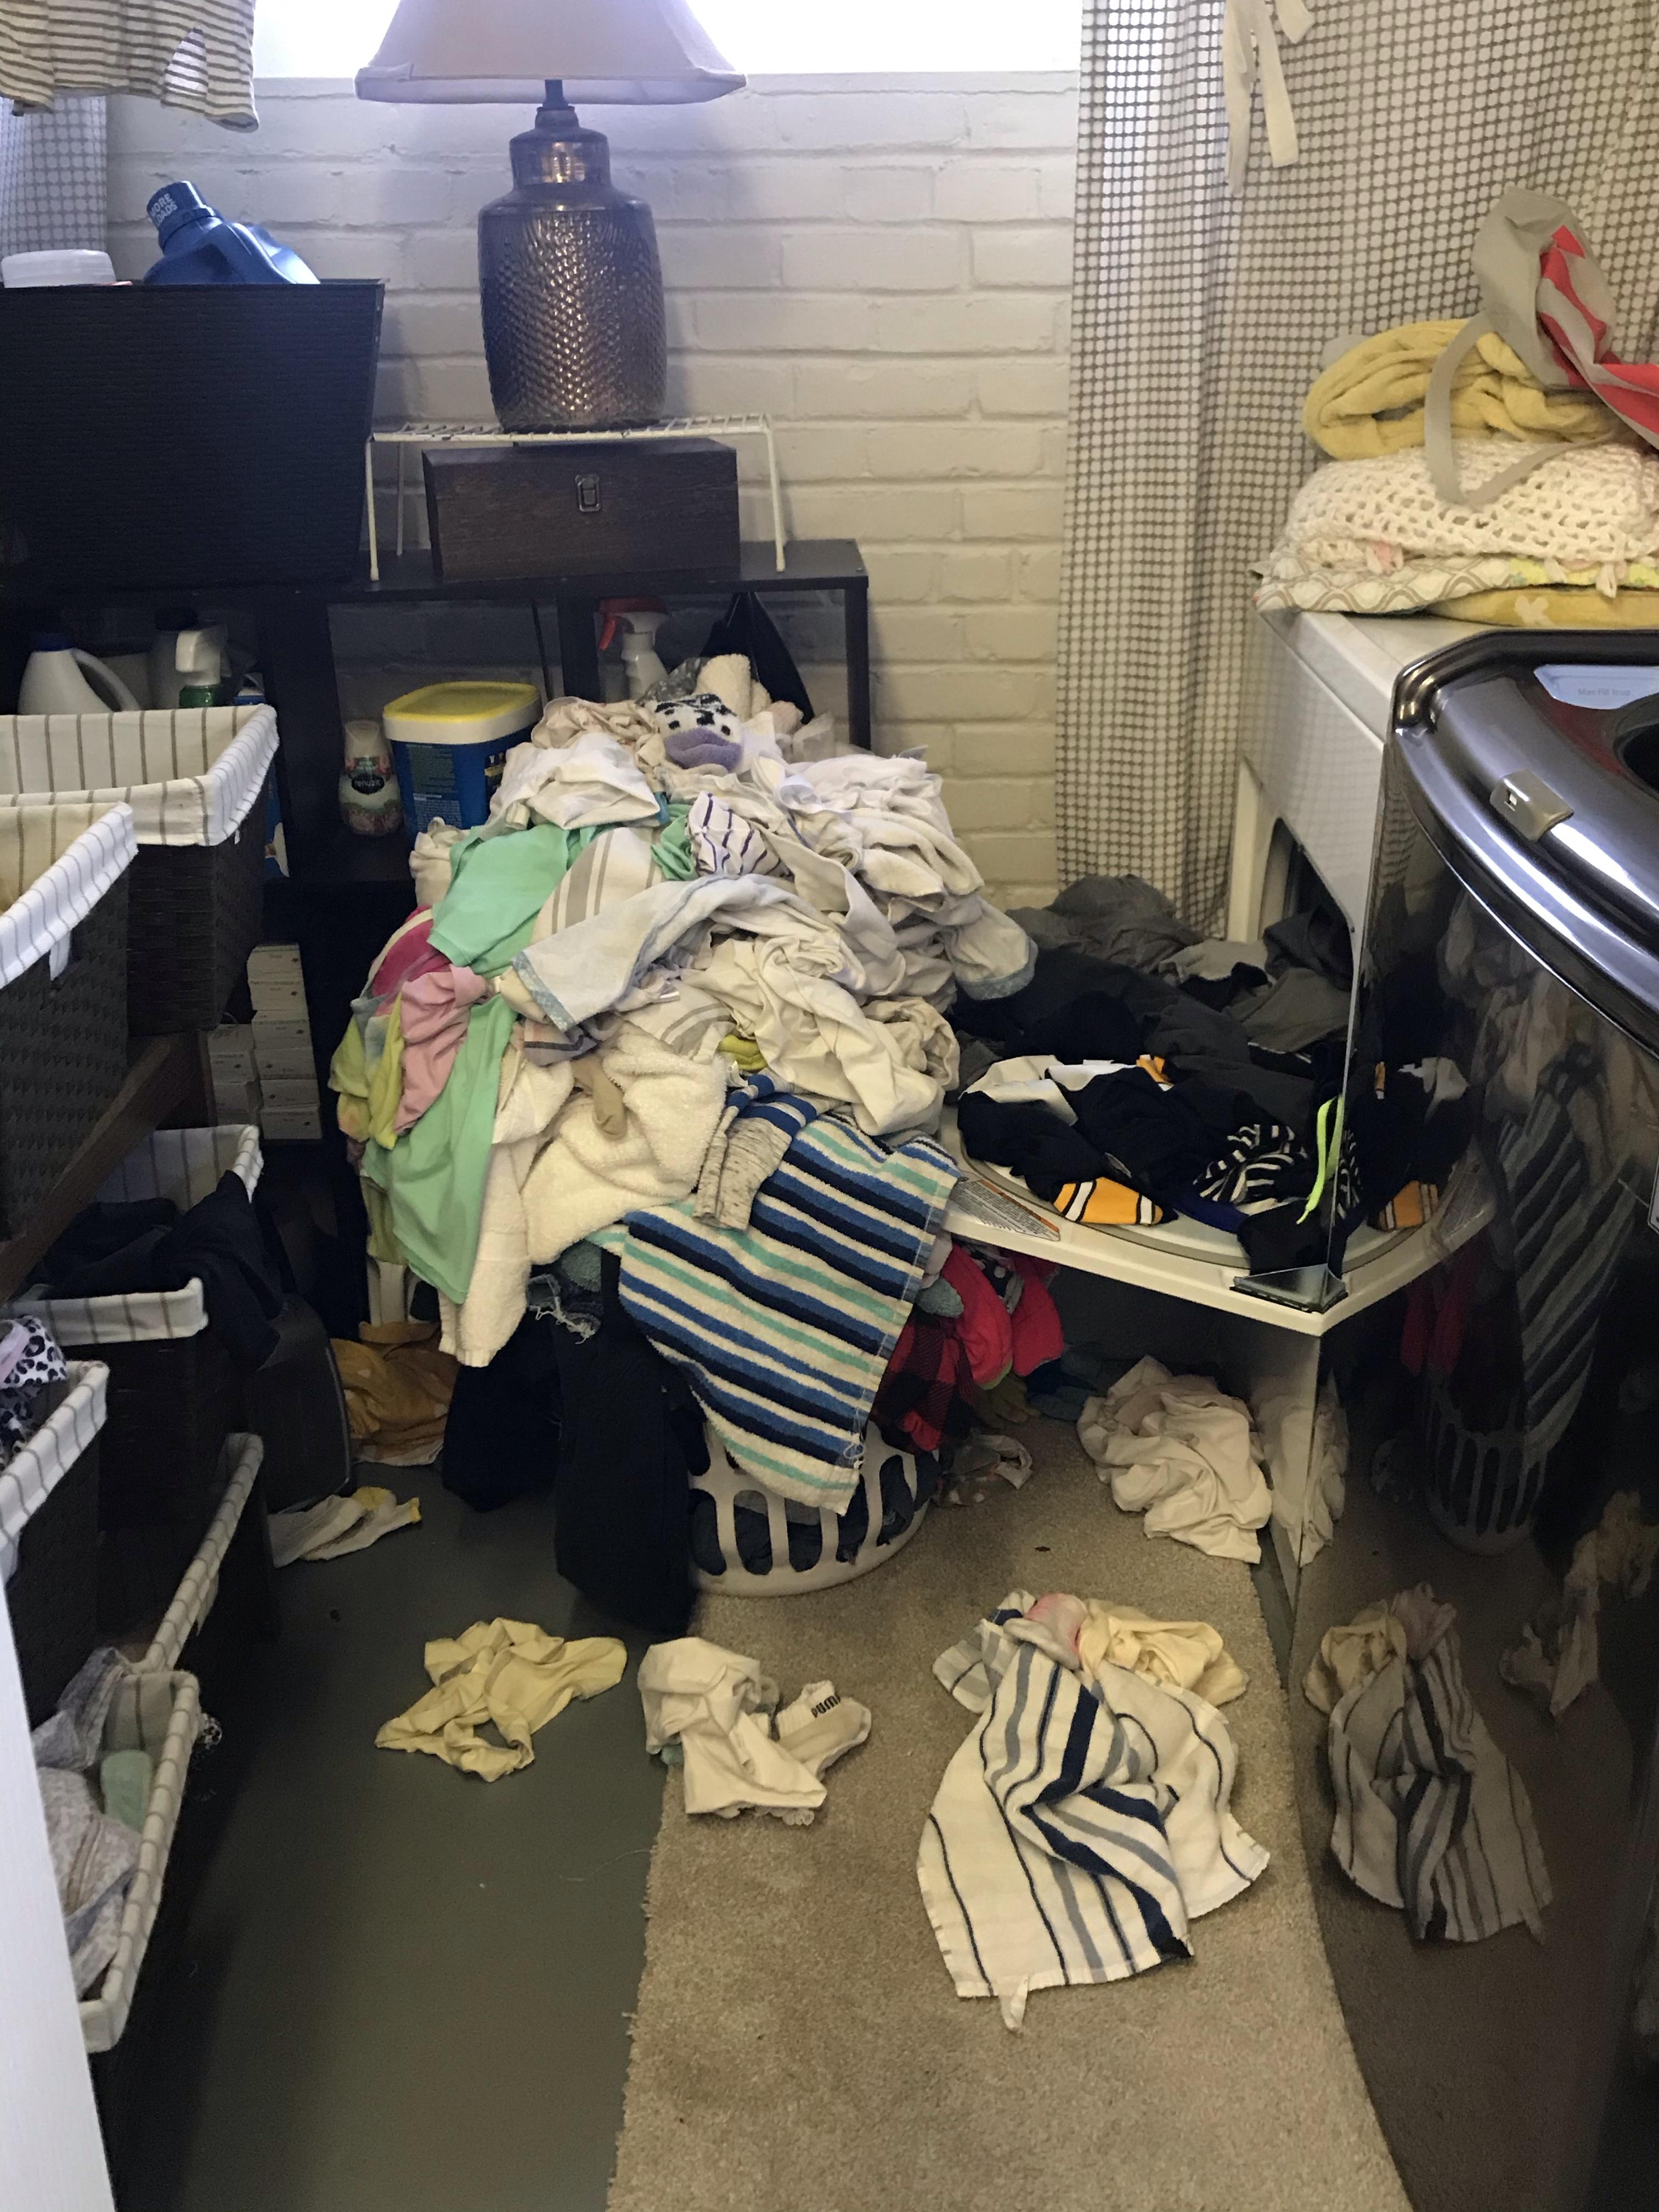 family of seven laundry pile